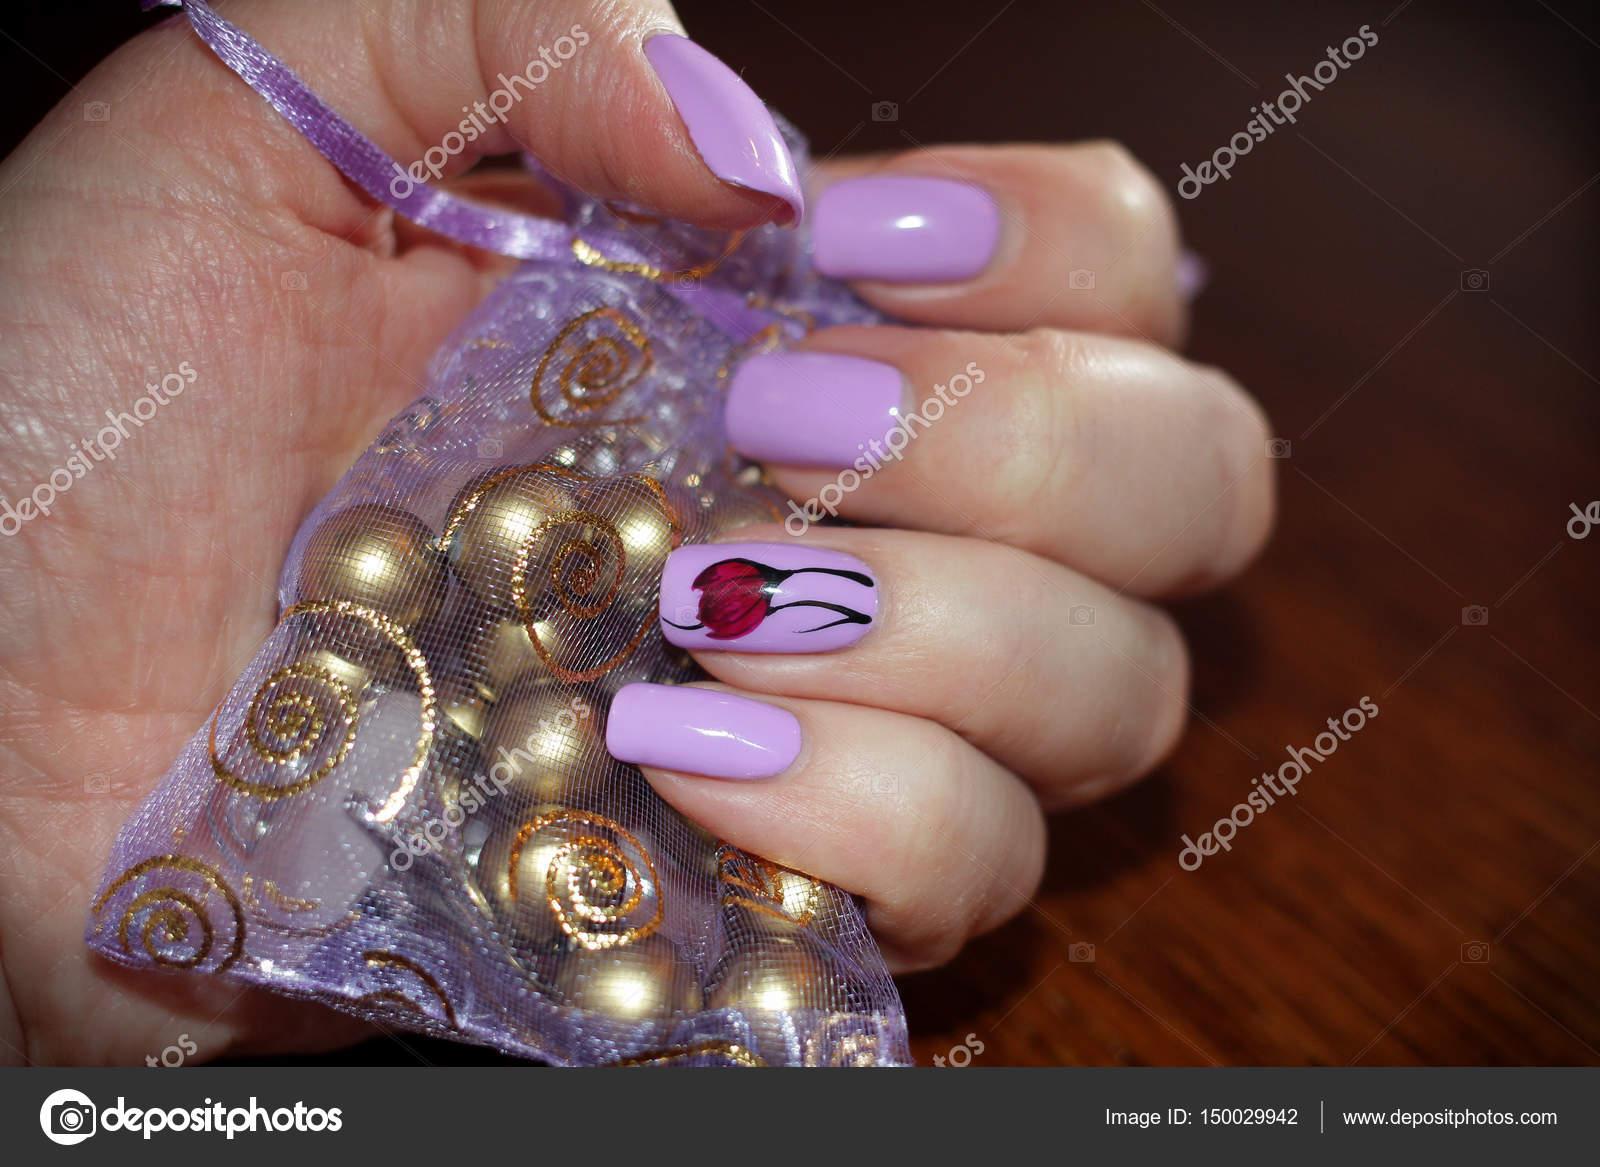 Nägel lila Farben in das design — Stockfoto © Bagira262626 #150029942